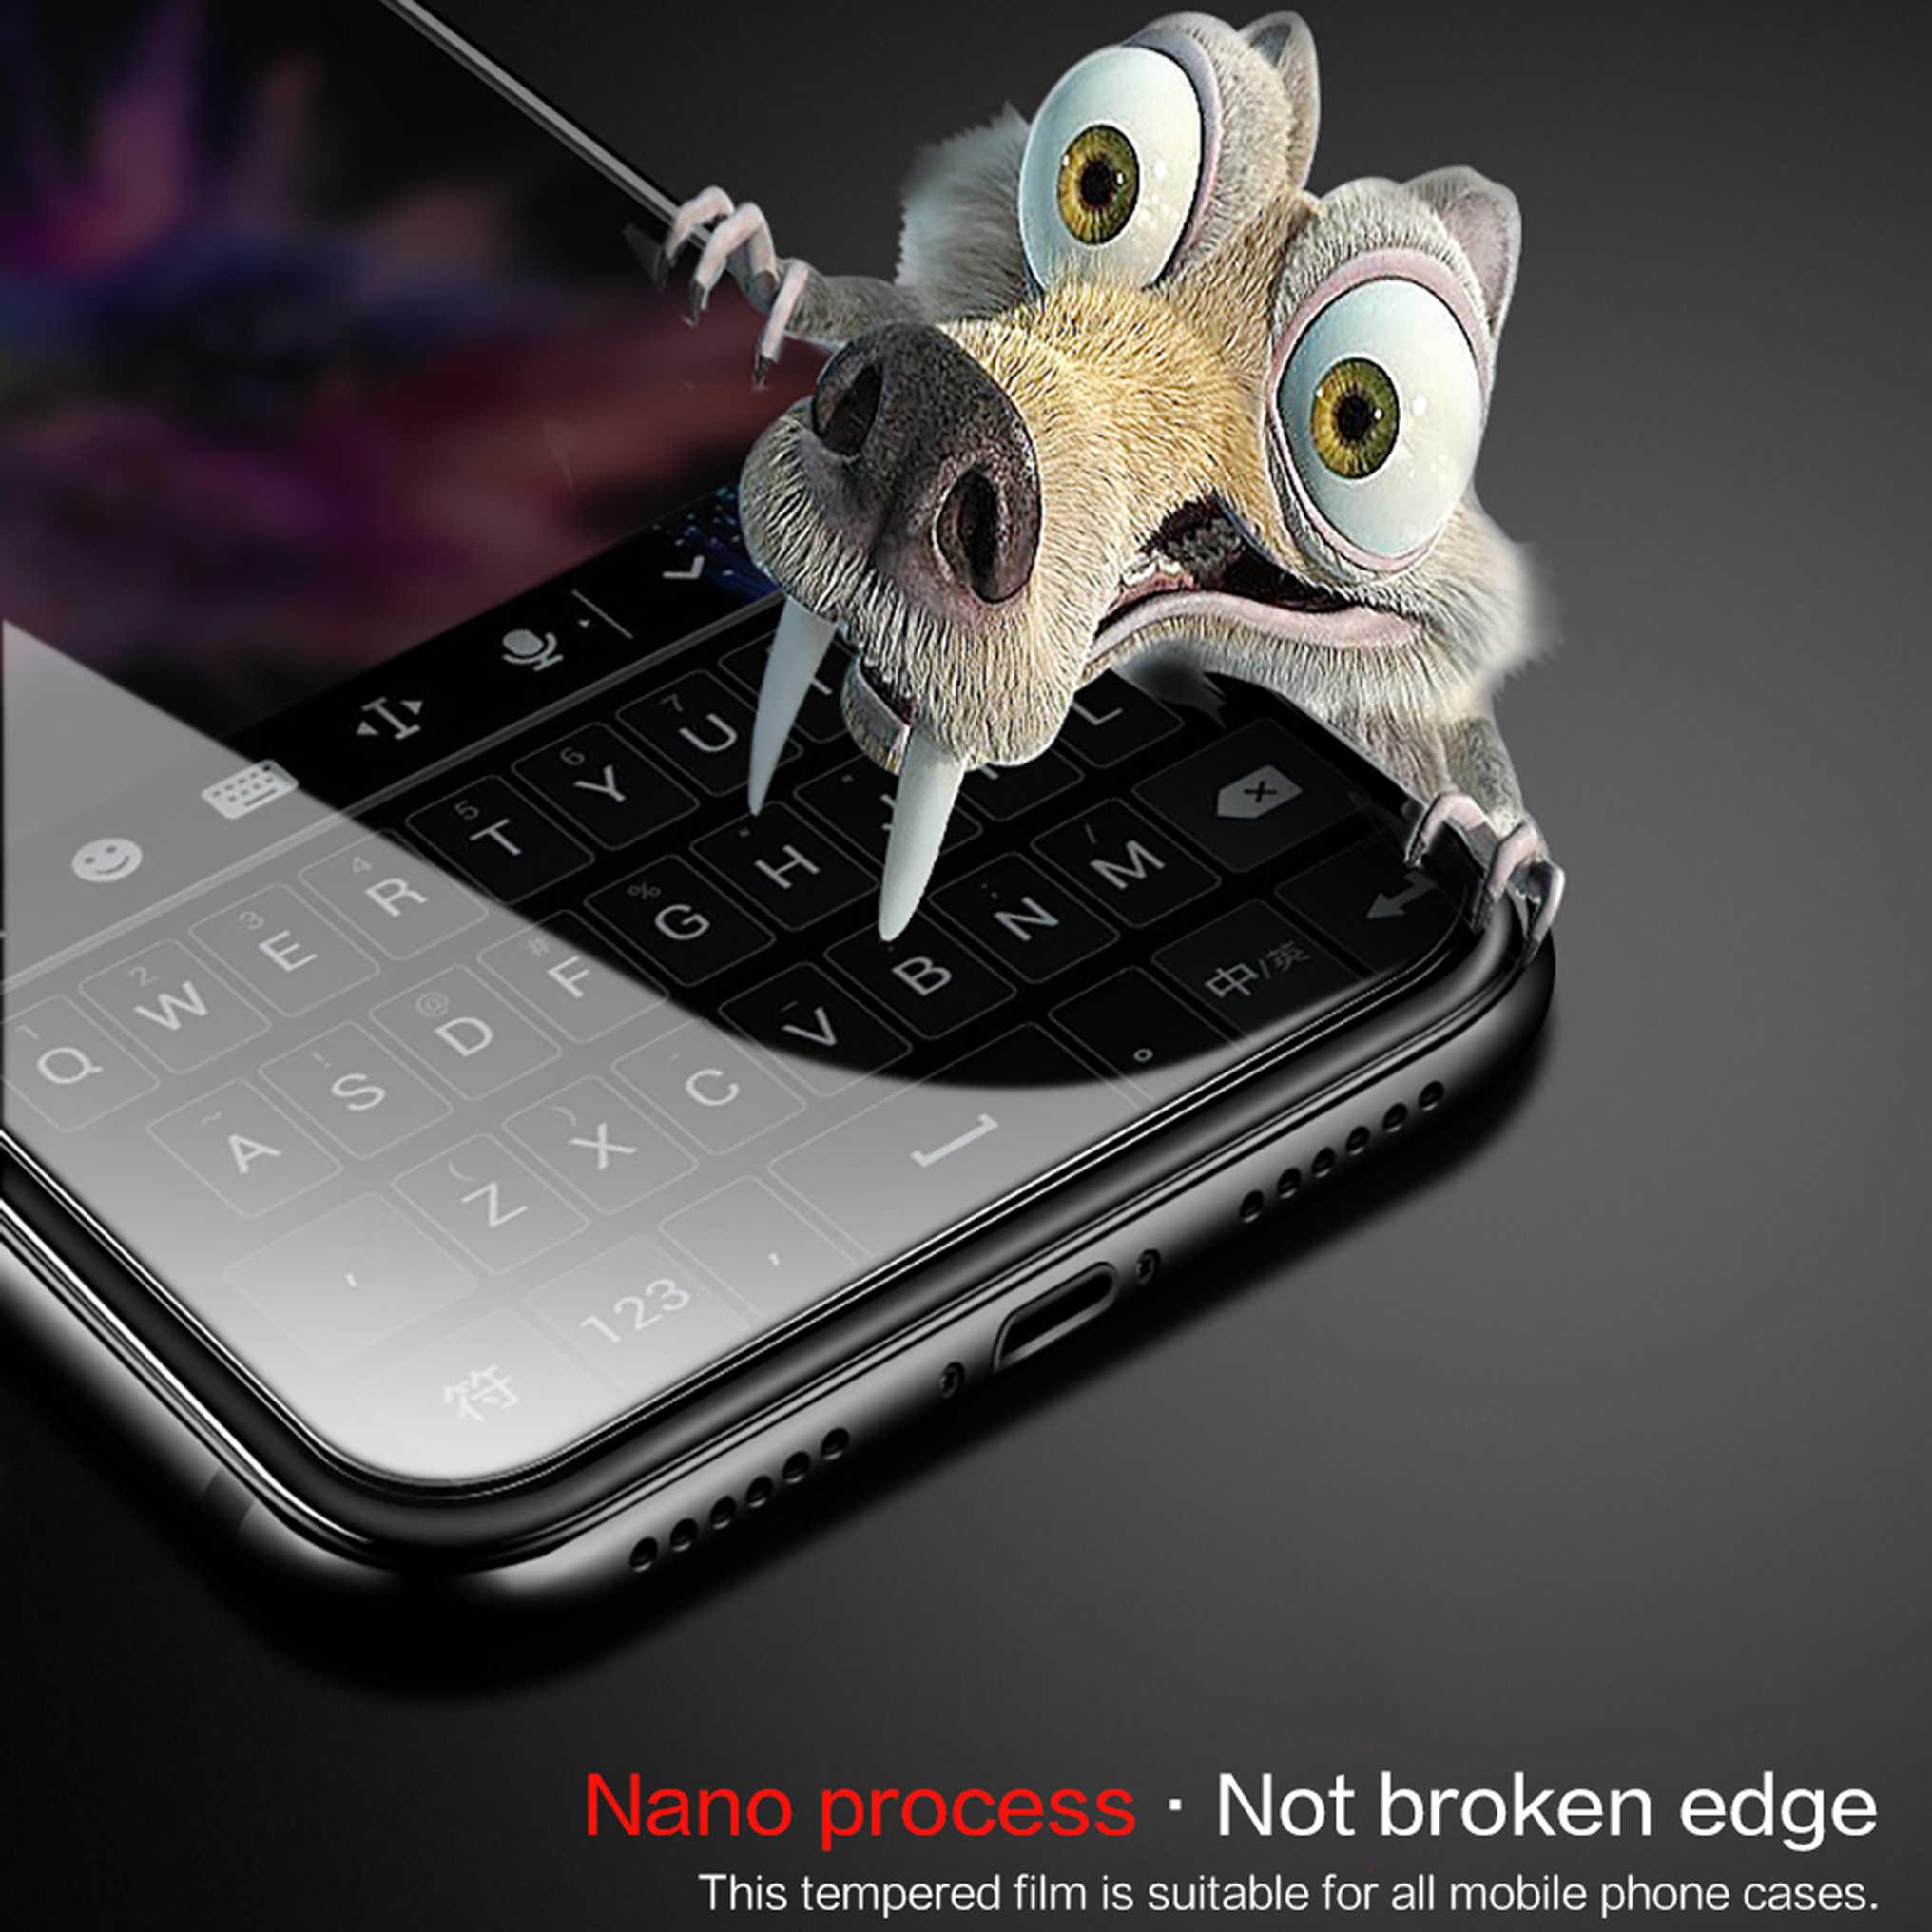 Envío Gratis LCD de cristal templado Protector de pantalla para Motorola Moto G2 G3 G4 G5 E4 E5 Plus jugar C4 Z2 z3 X Z C Plus jugar